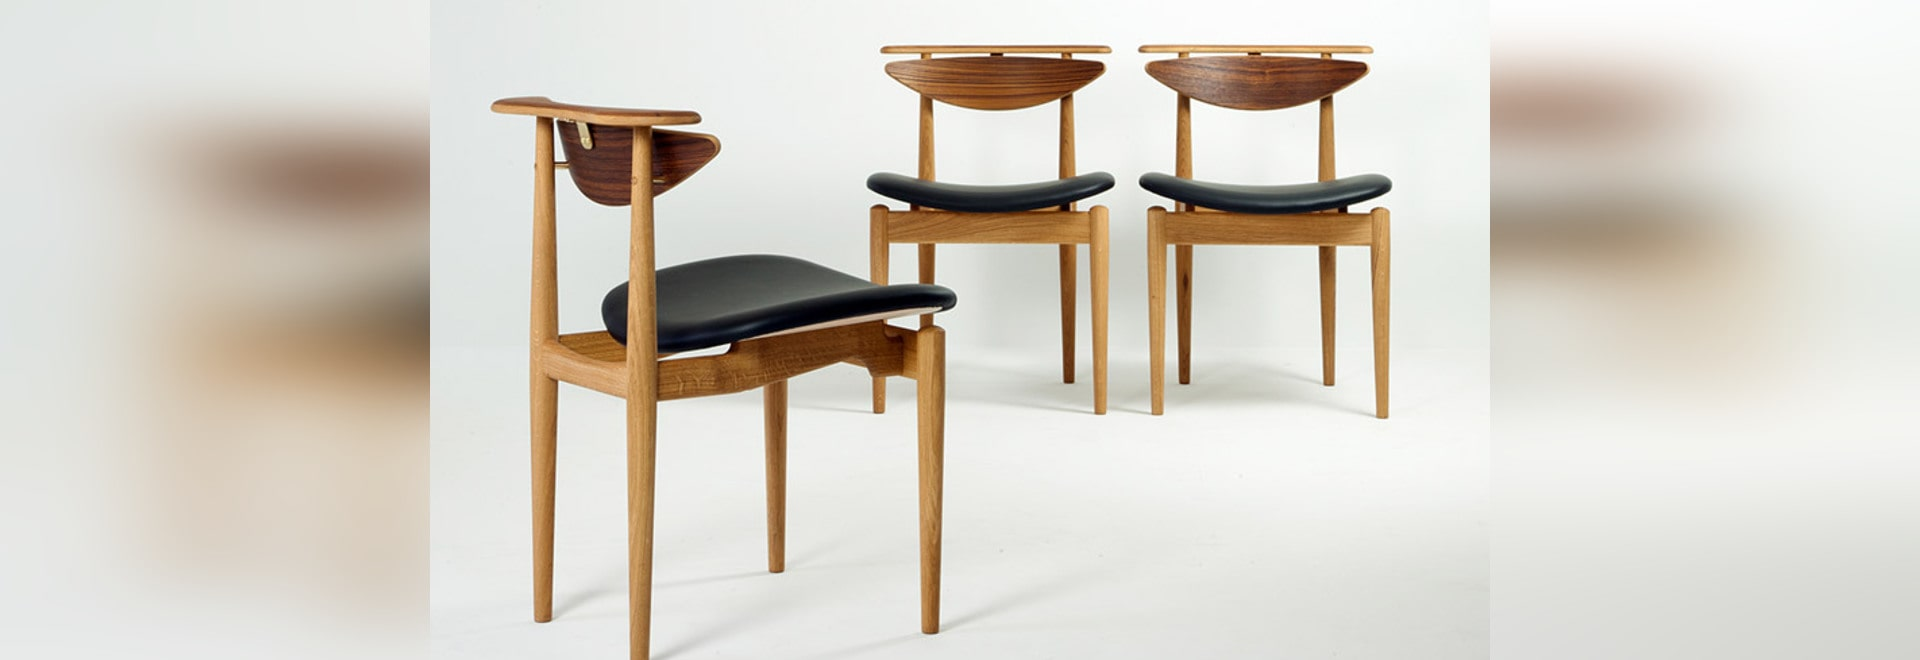 Bon Marché to host Finn Juhl furniture exhibition